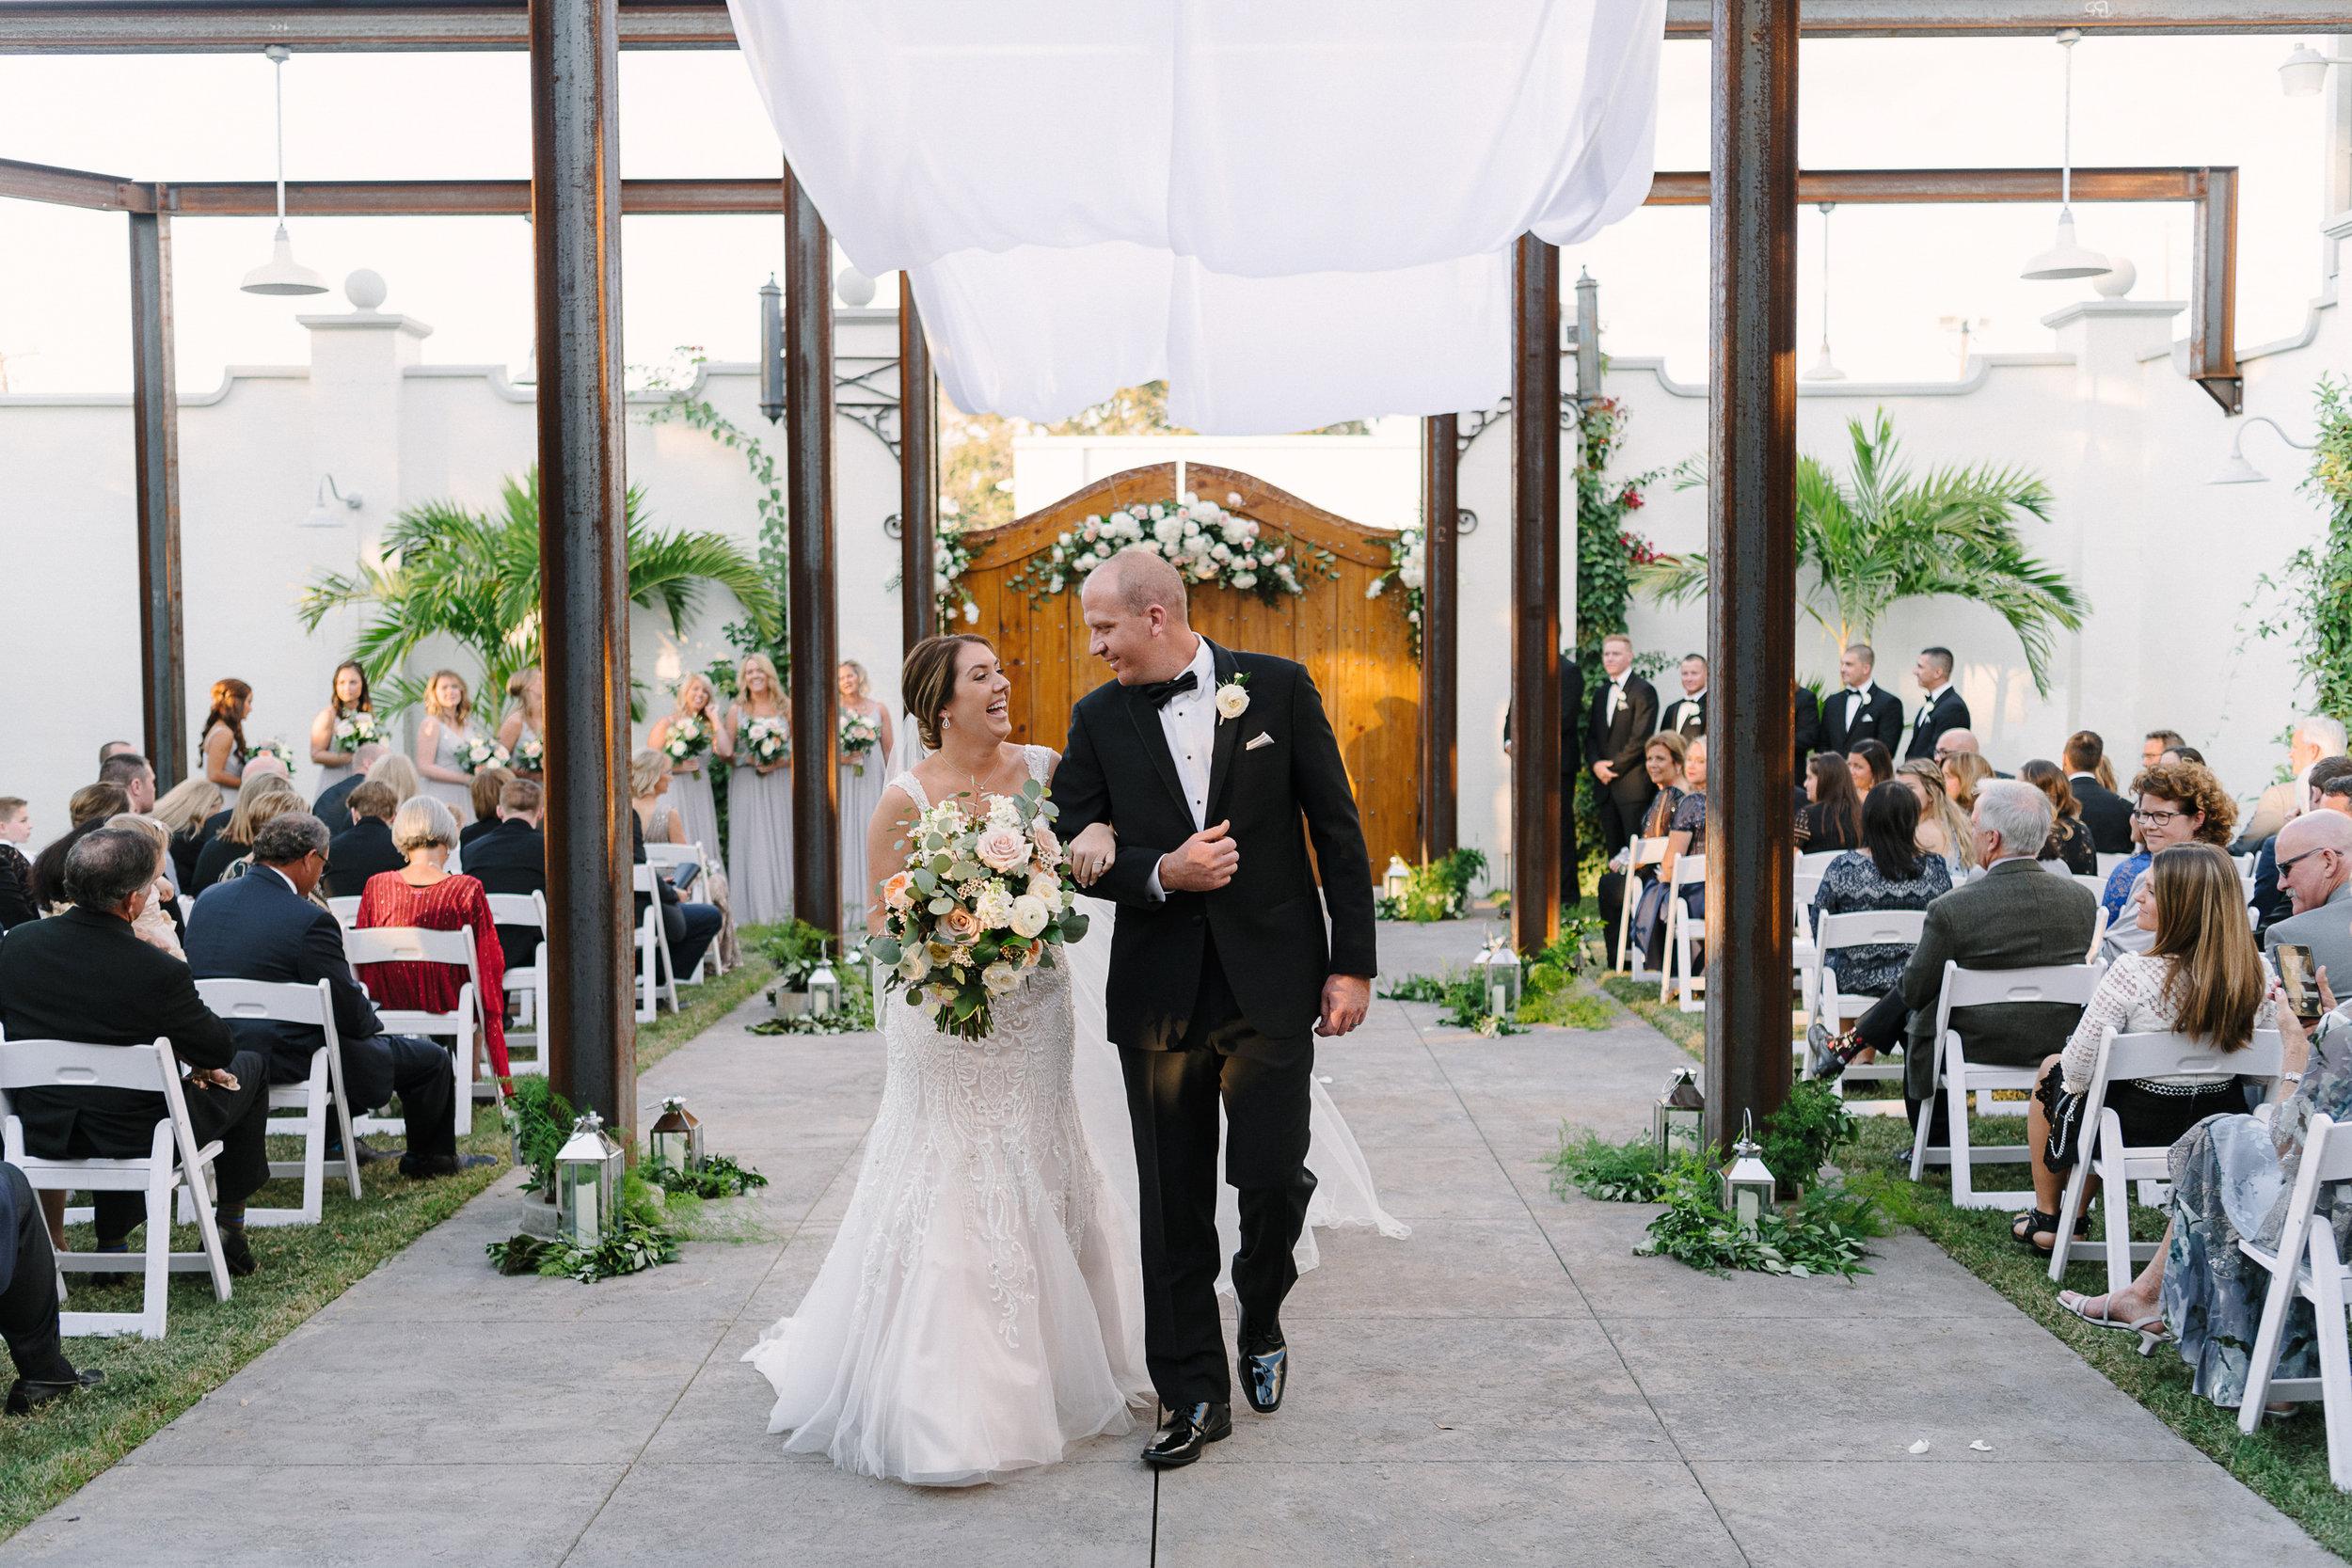 Sunglow Photography Venue 650 Winter Haven Florida Wedding